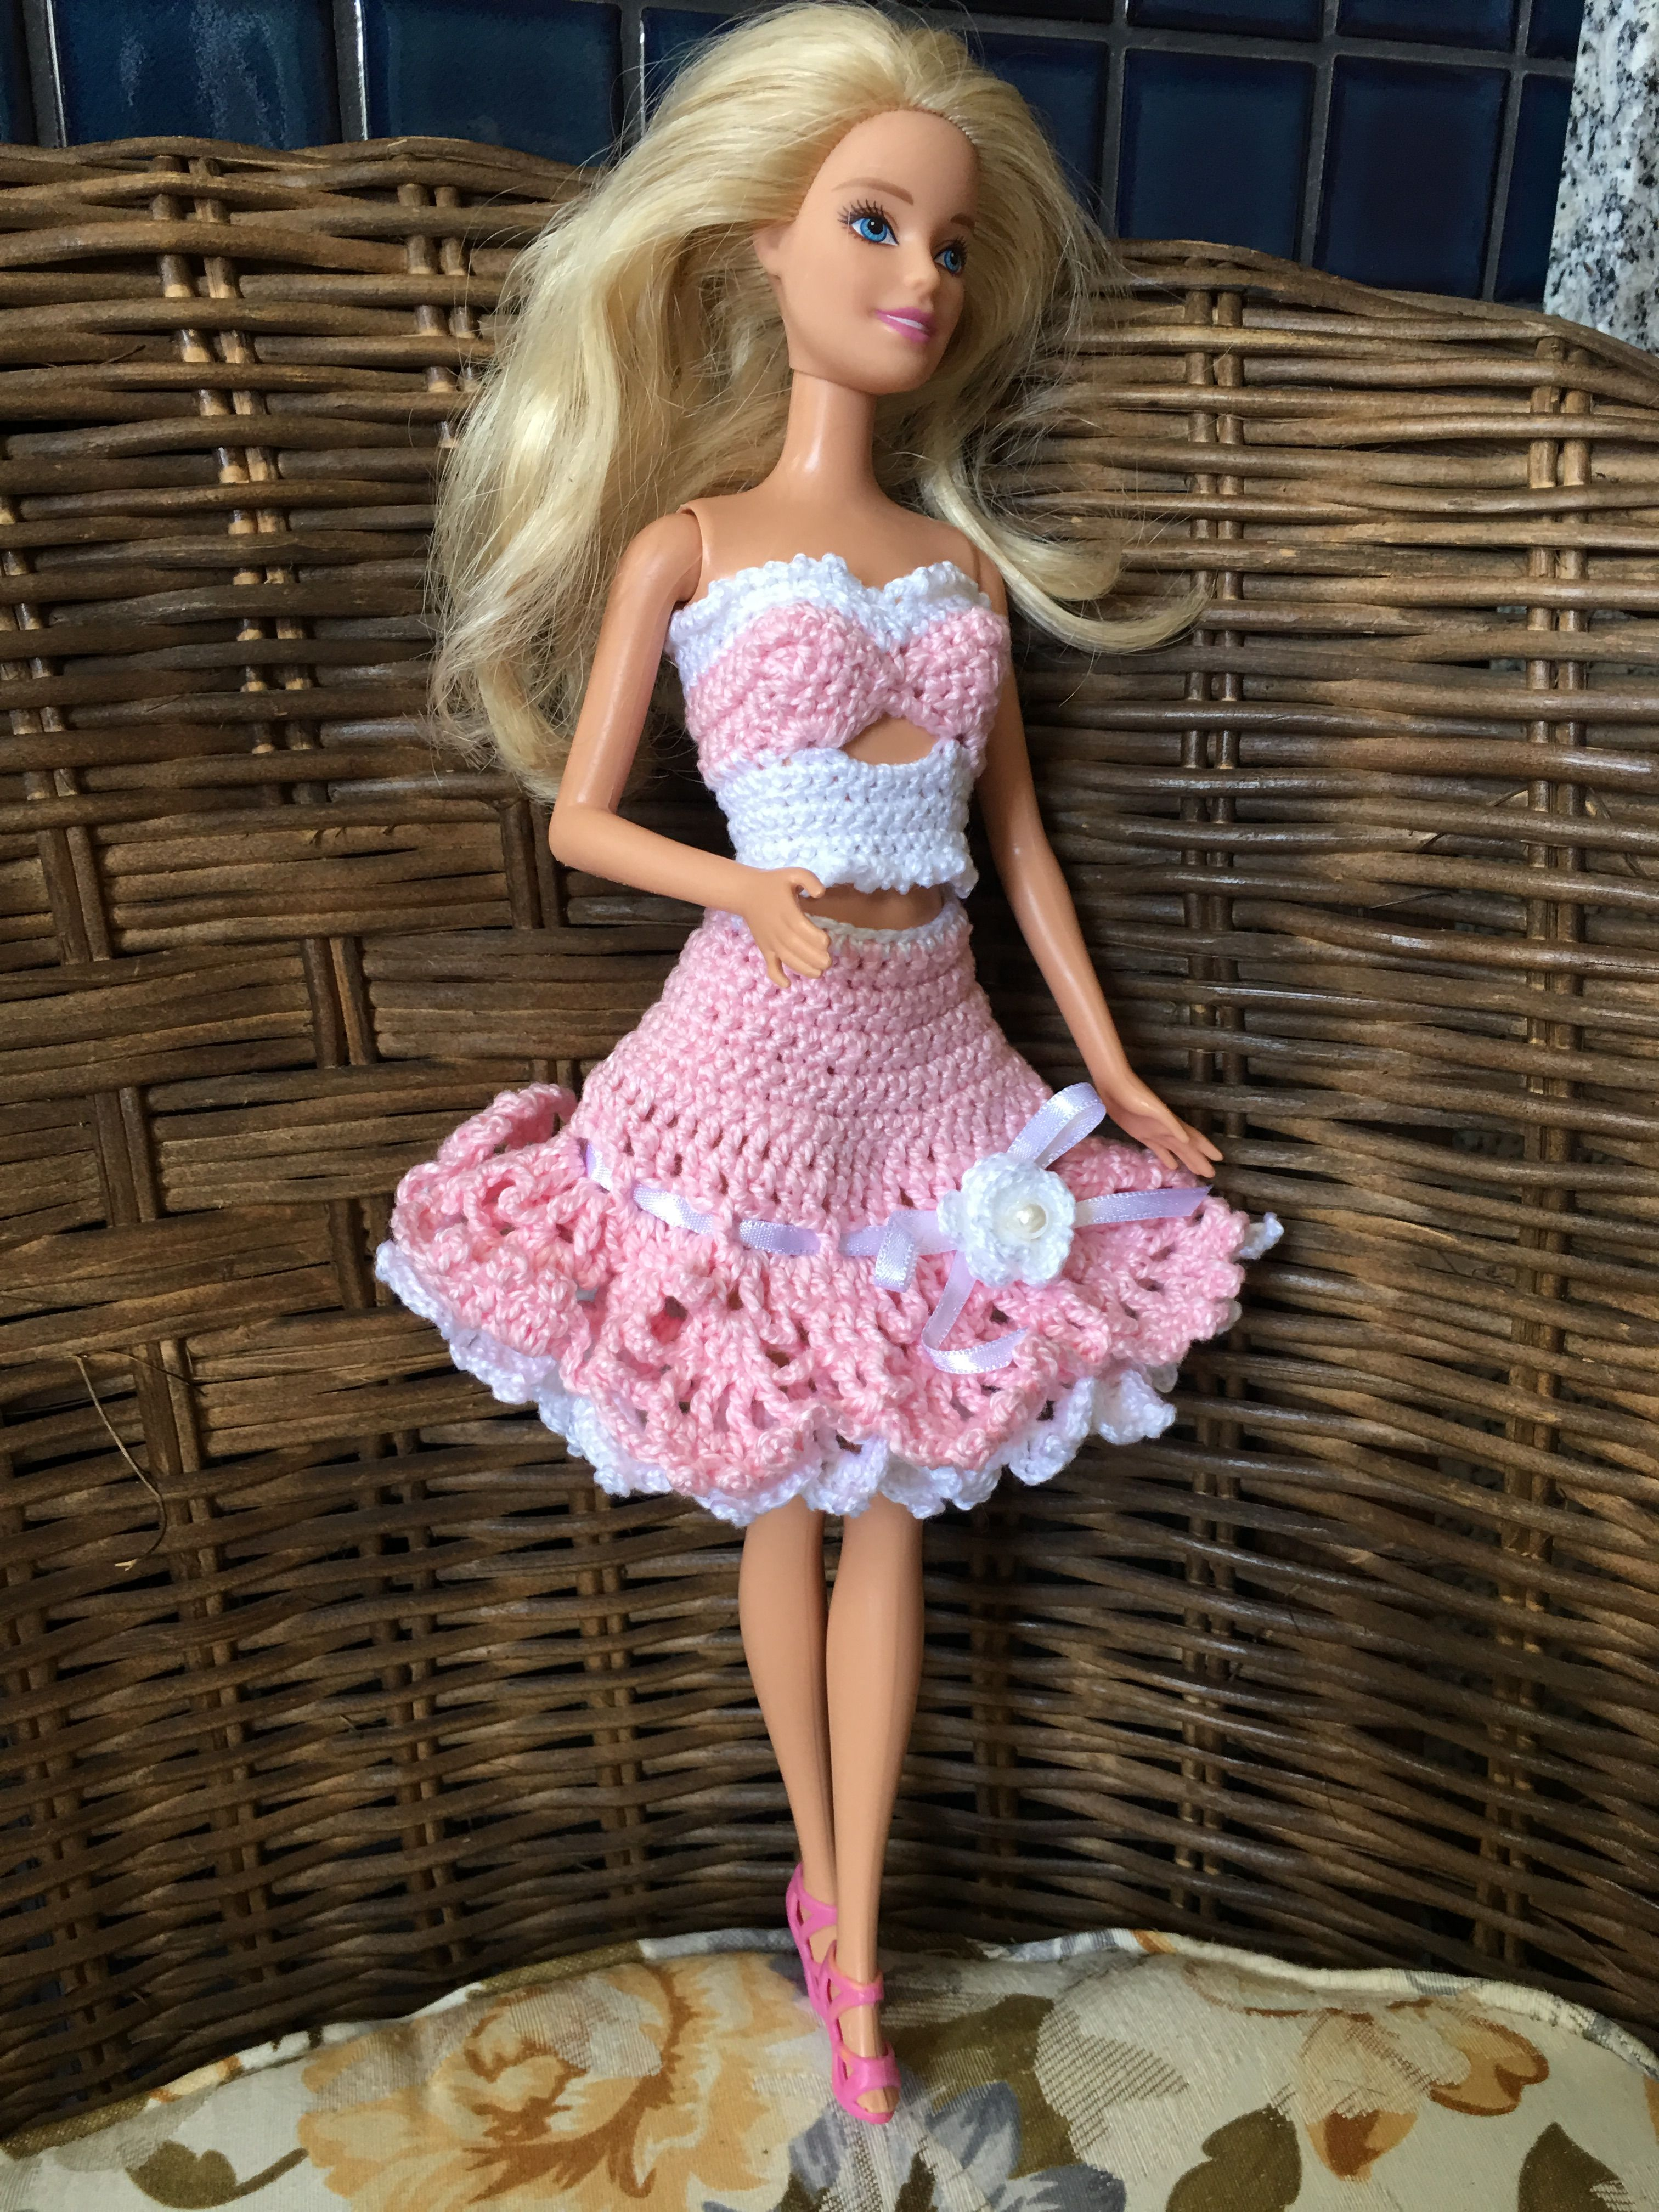 Pin By Dautz Sylvia On Barbykleider Pinterest Barbie Kleider